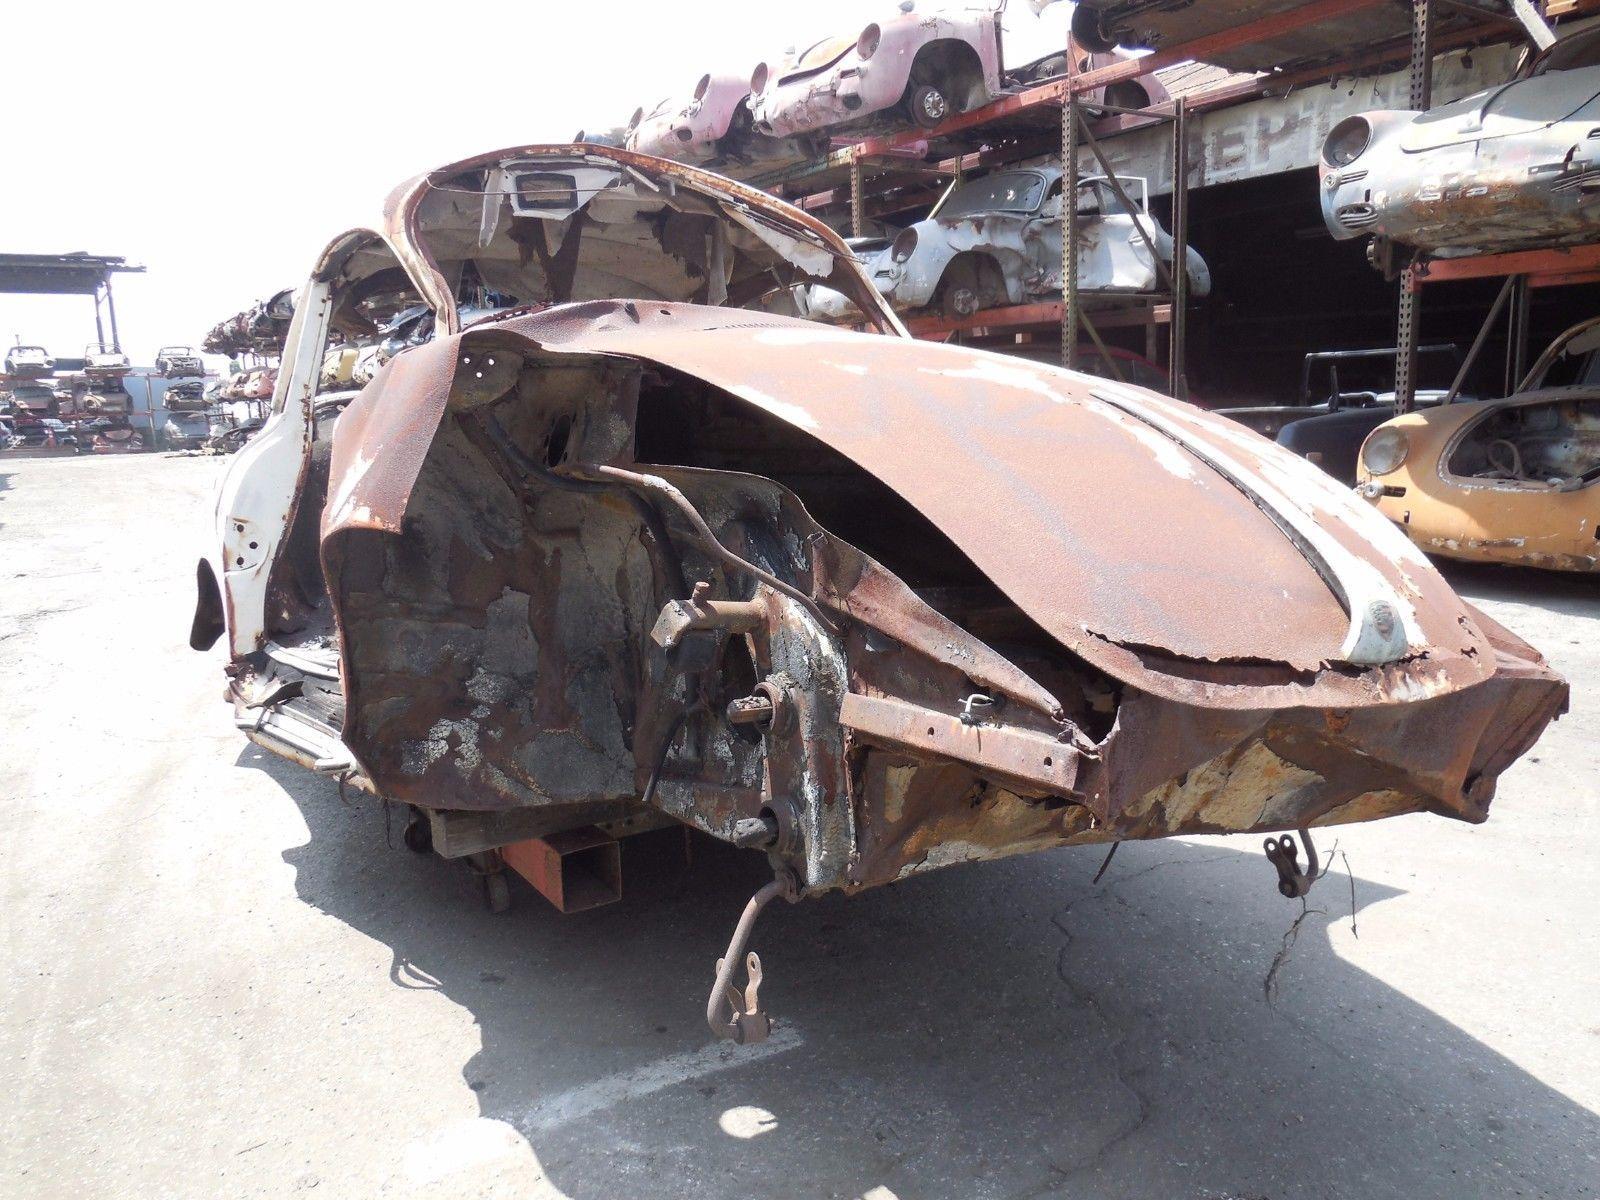 Missing engine 1963 Porsche 356 B S 90 Coupe Project